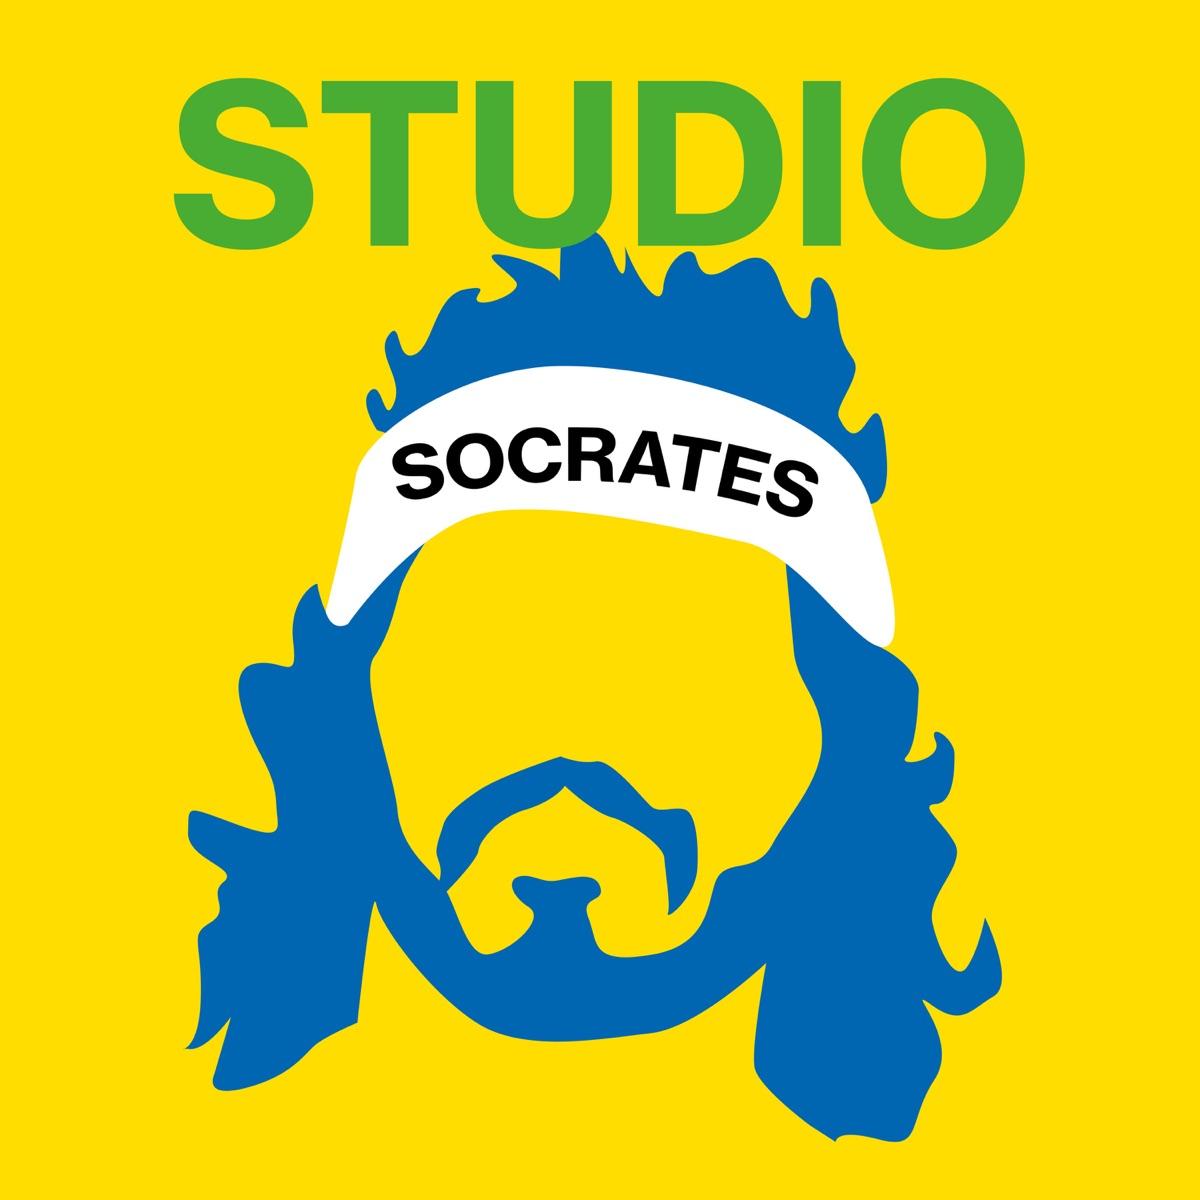 Studio Socrates